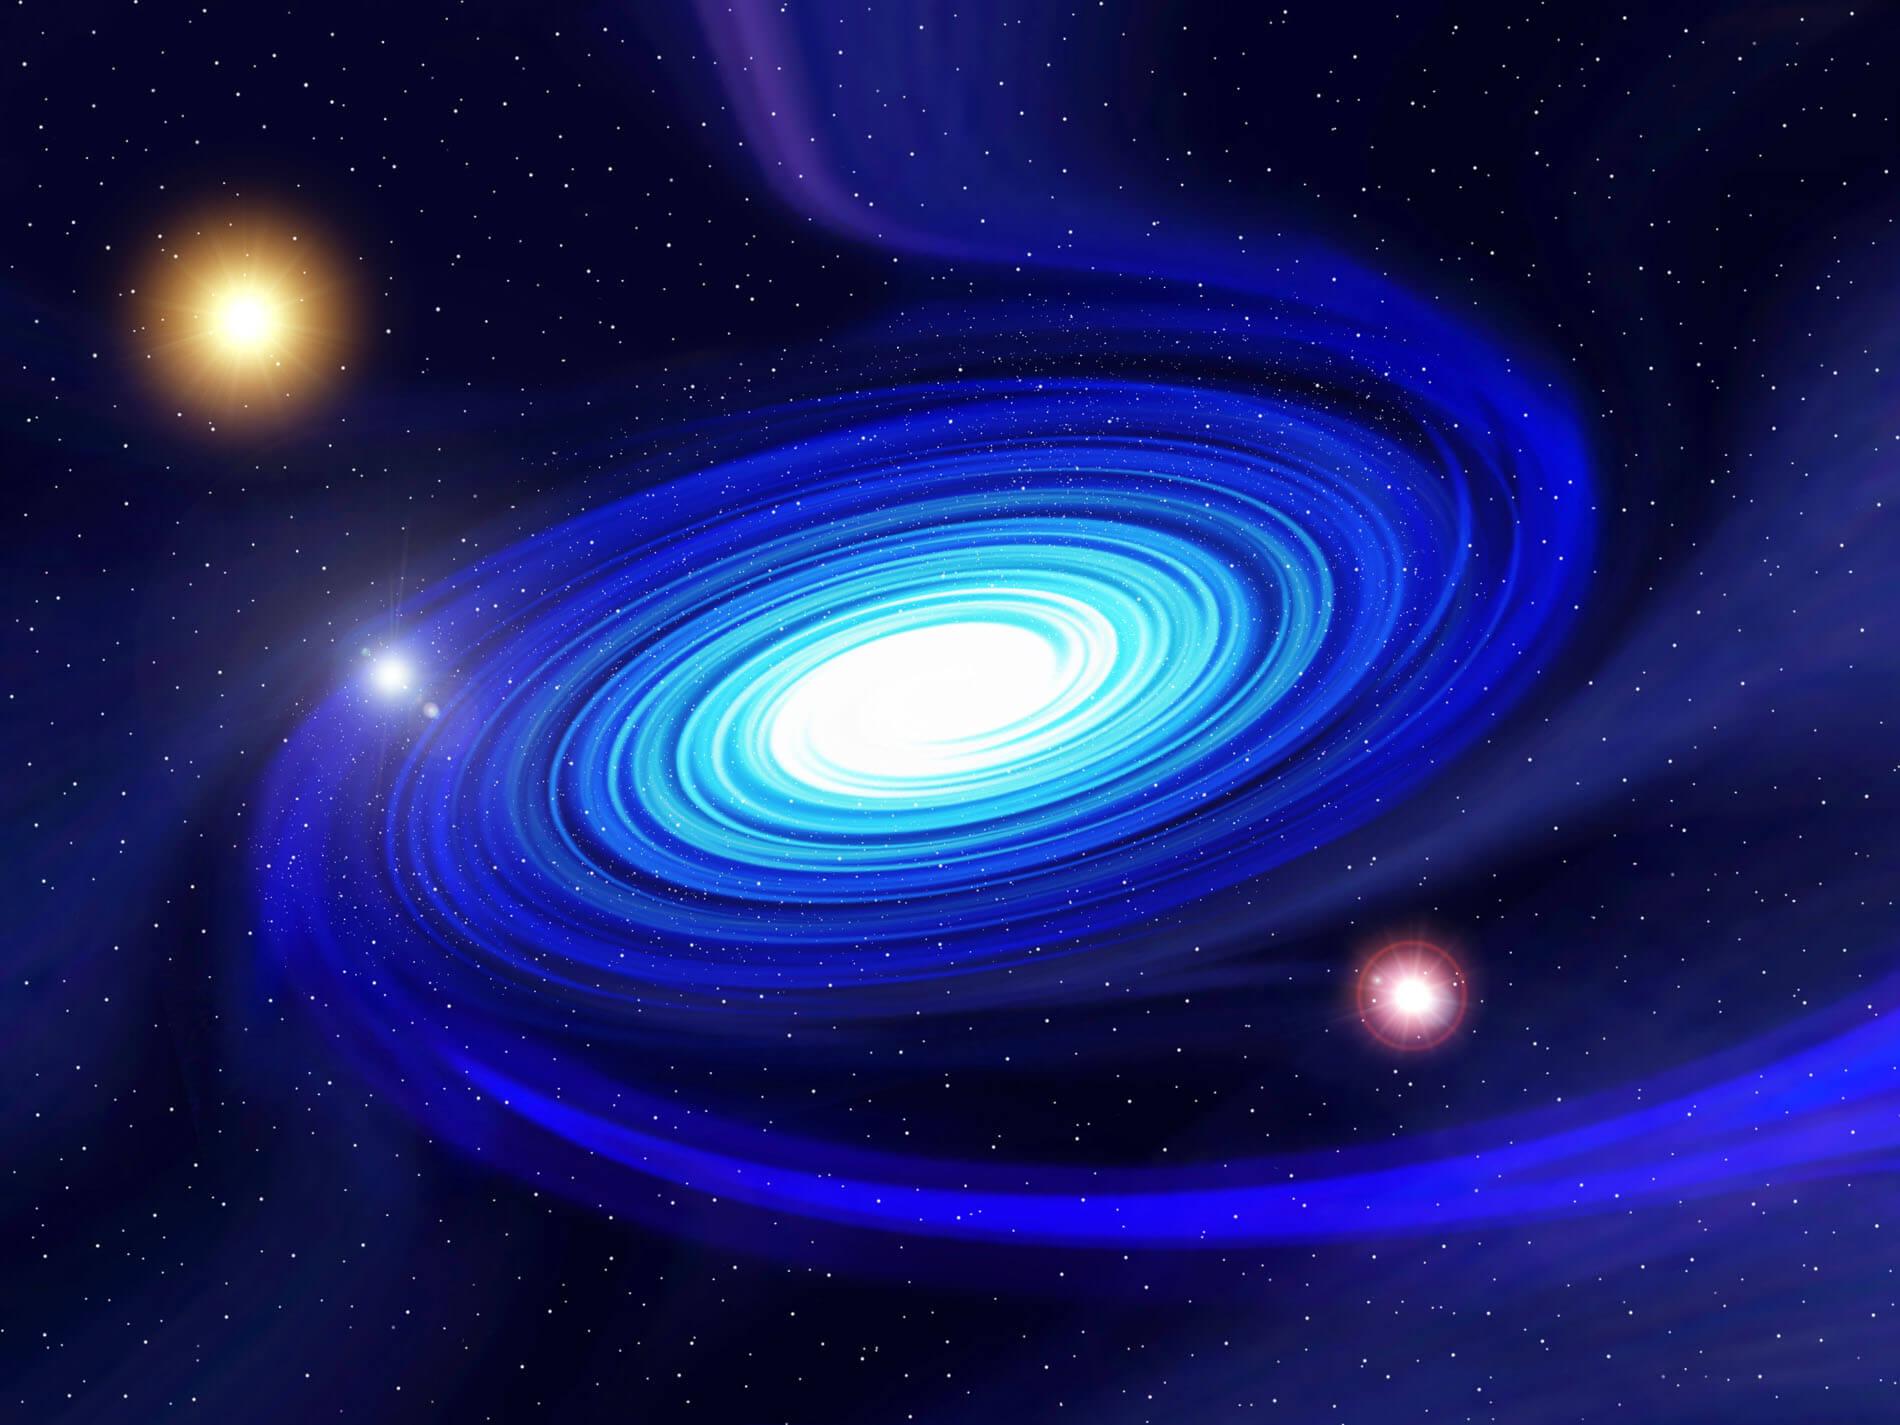 fantasy spiral galaxy